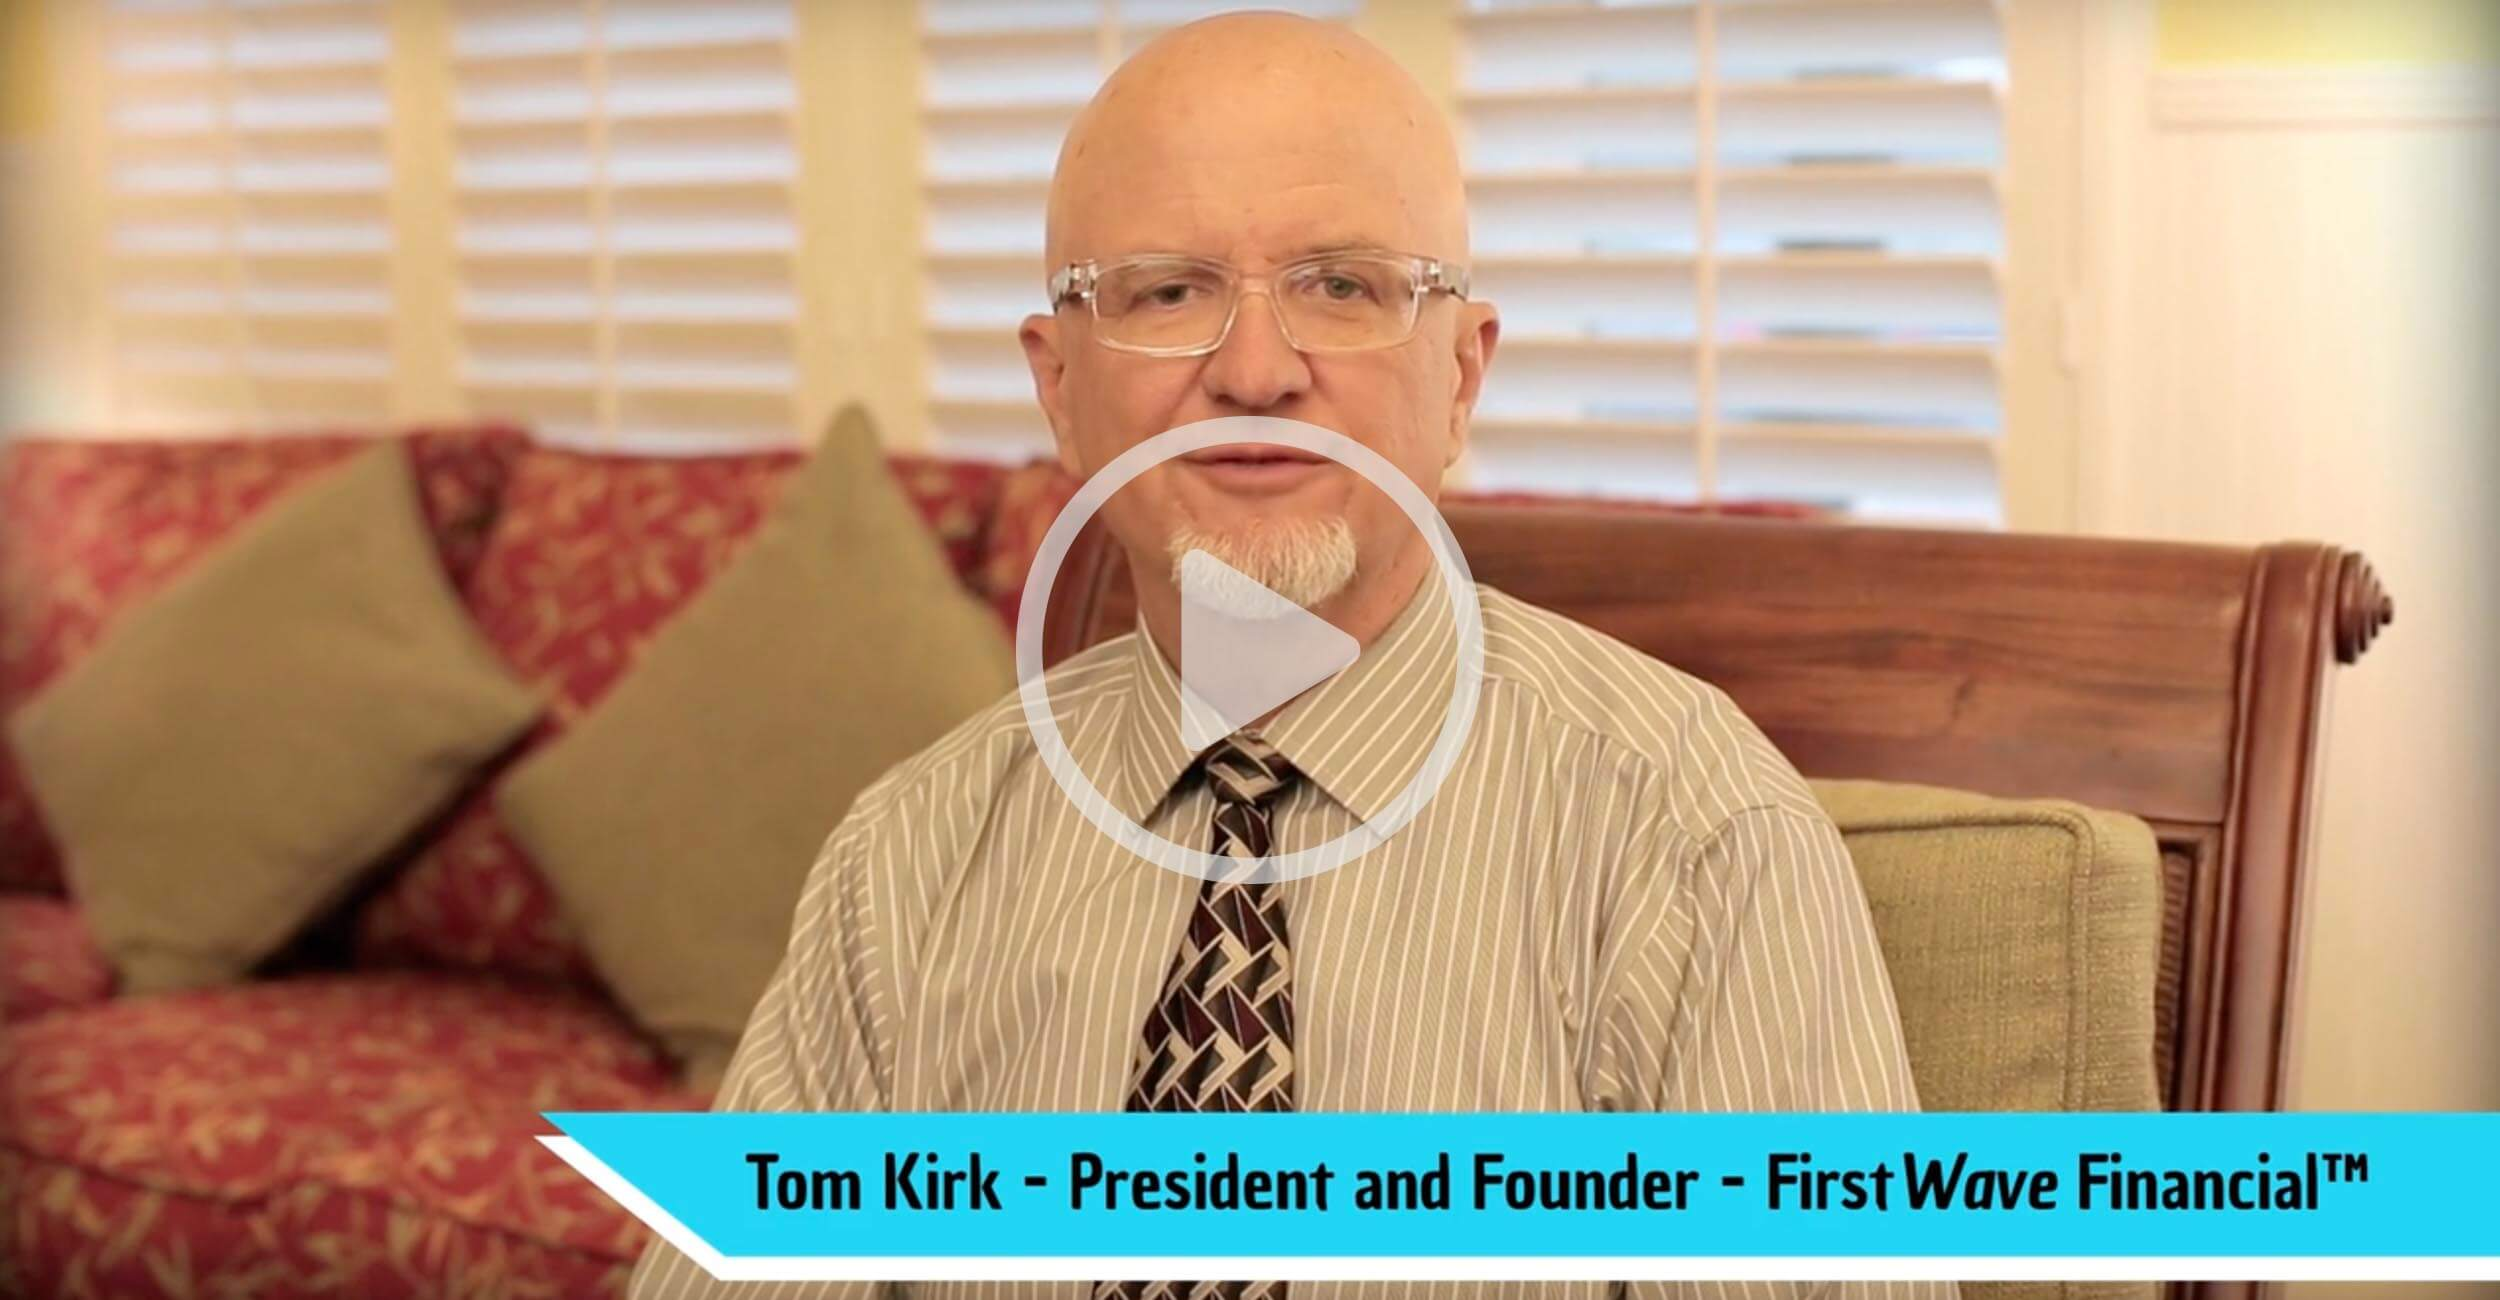 Black Tie Digital Marketing Testimonial